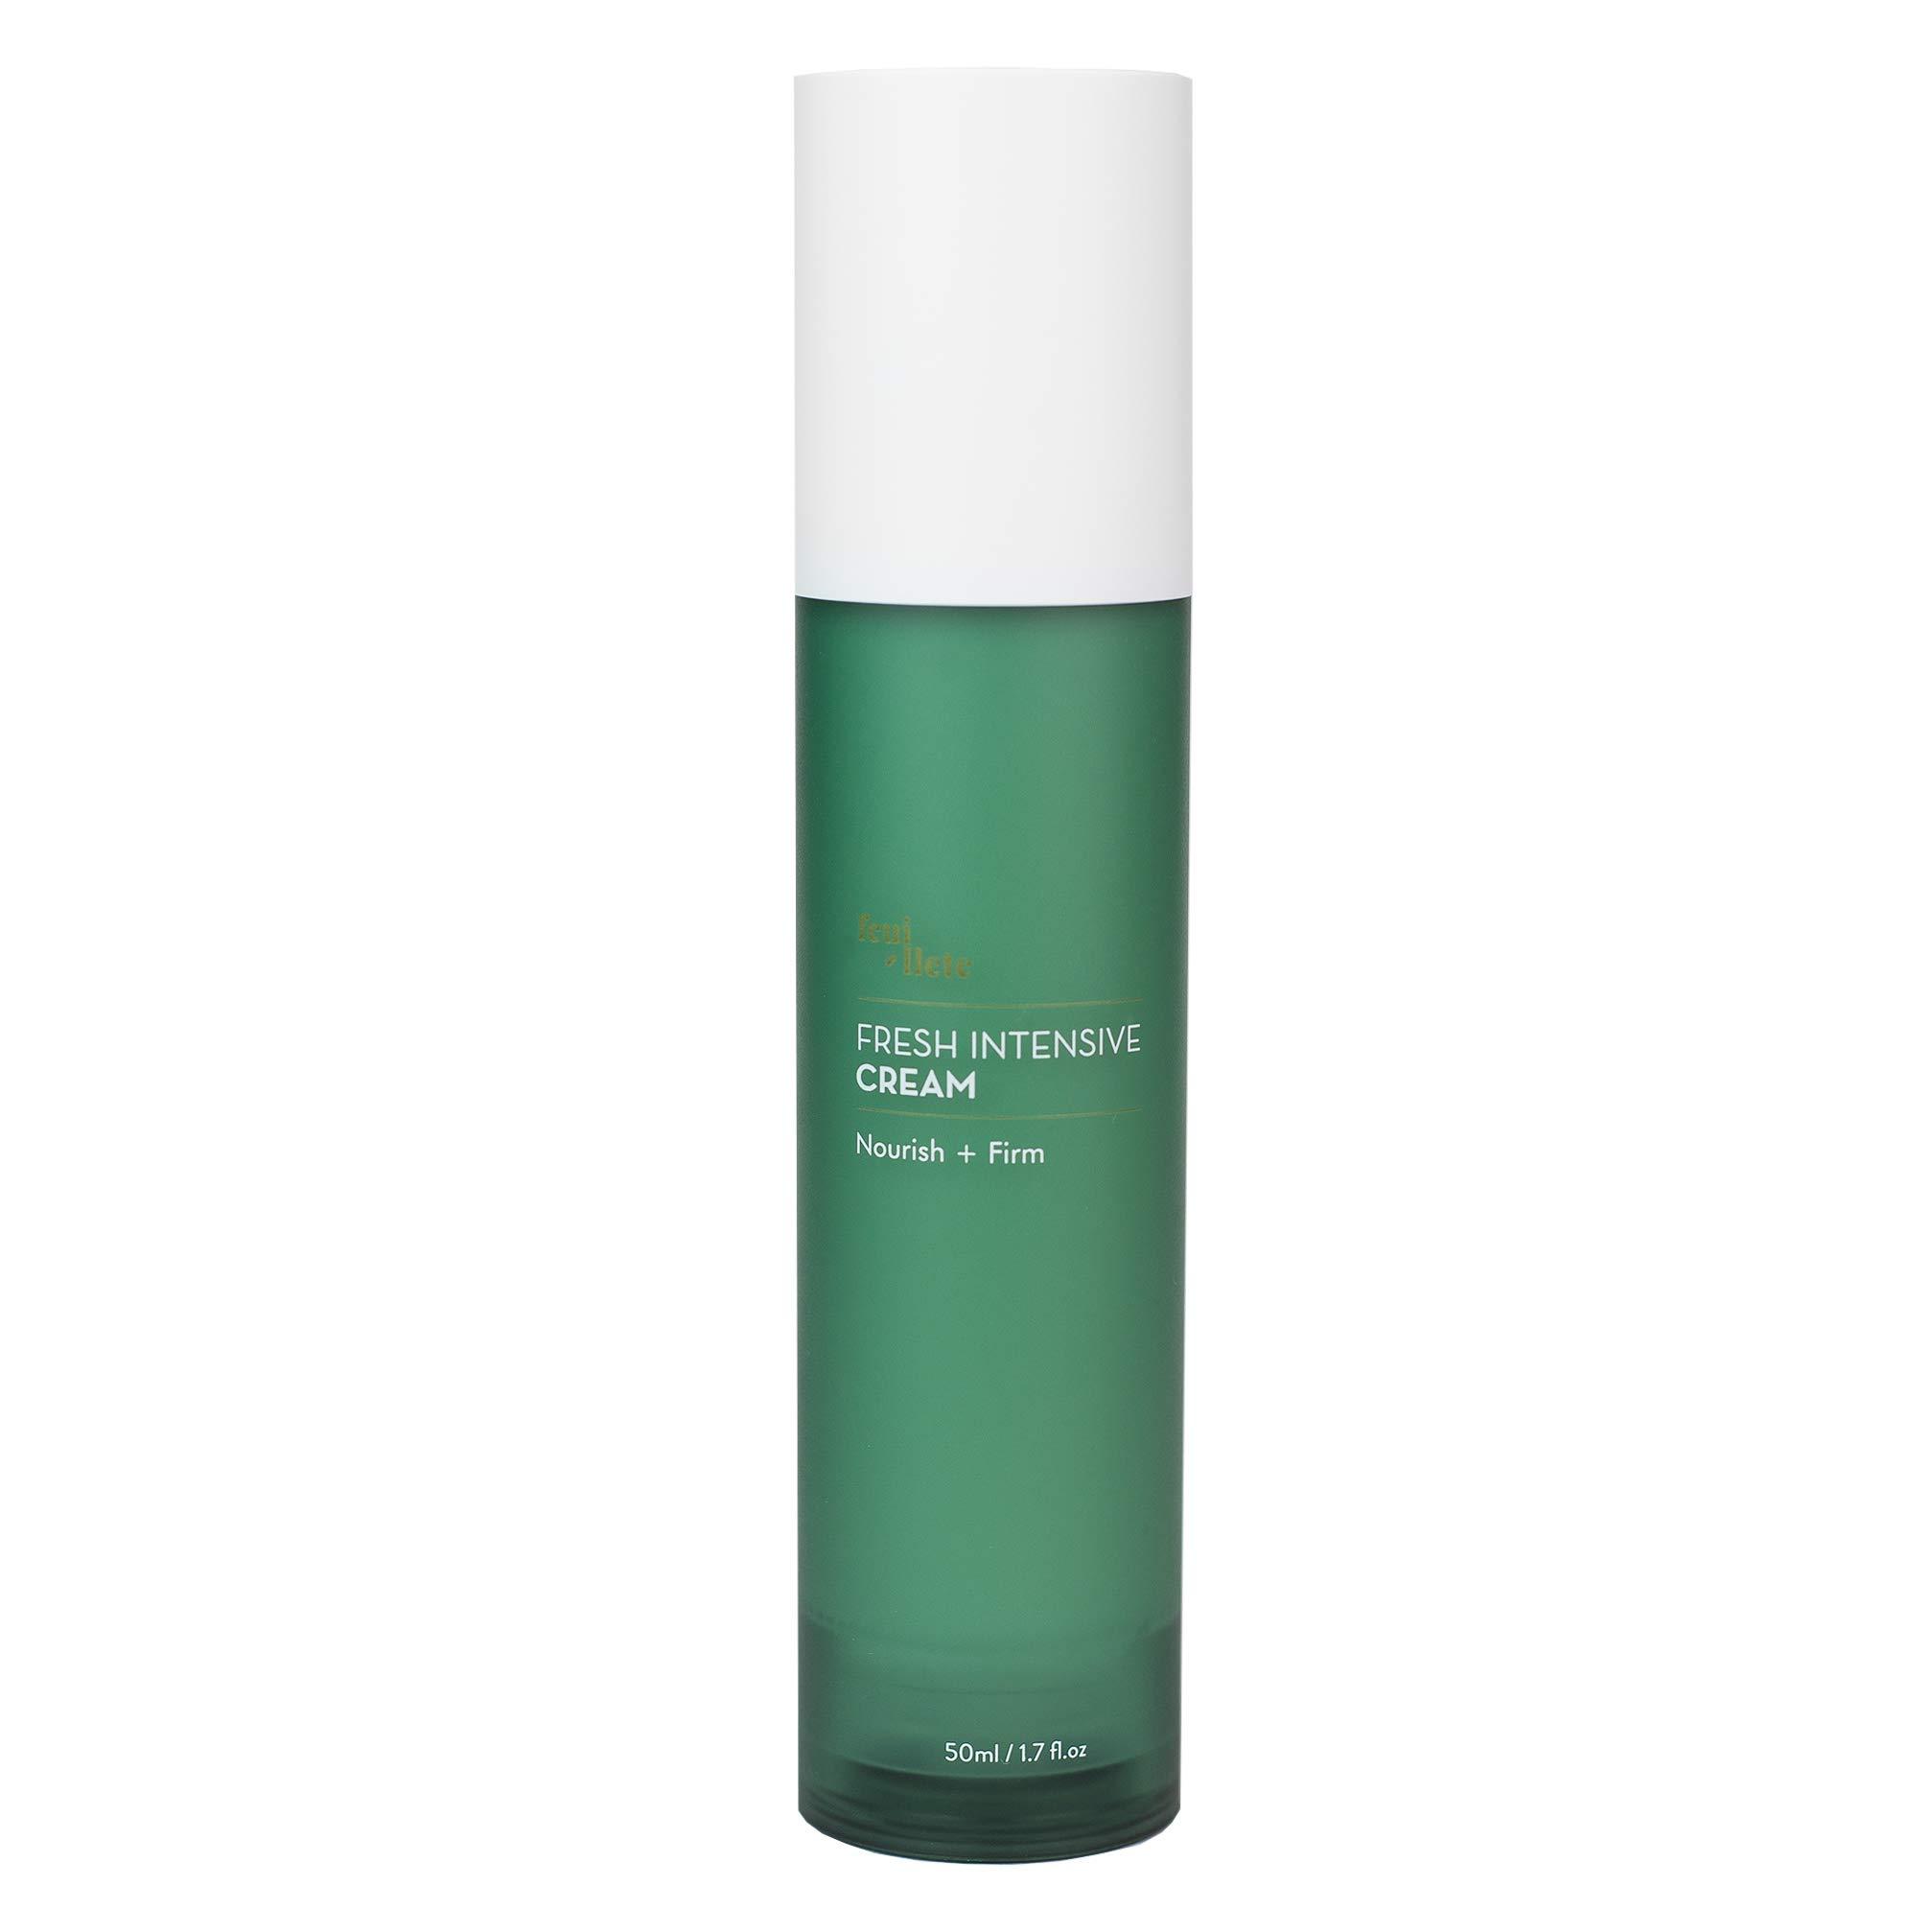 Feuillete Fresh Intensive Cream, 50 ml - Centella Asiatica Ceramide Water Cream Face Moisturizer, Soothing Hydrating Brightening For Sensitive Oily Acne Prone Skin